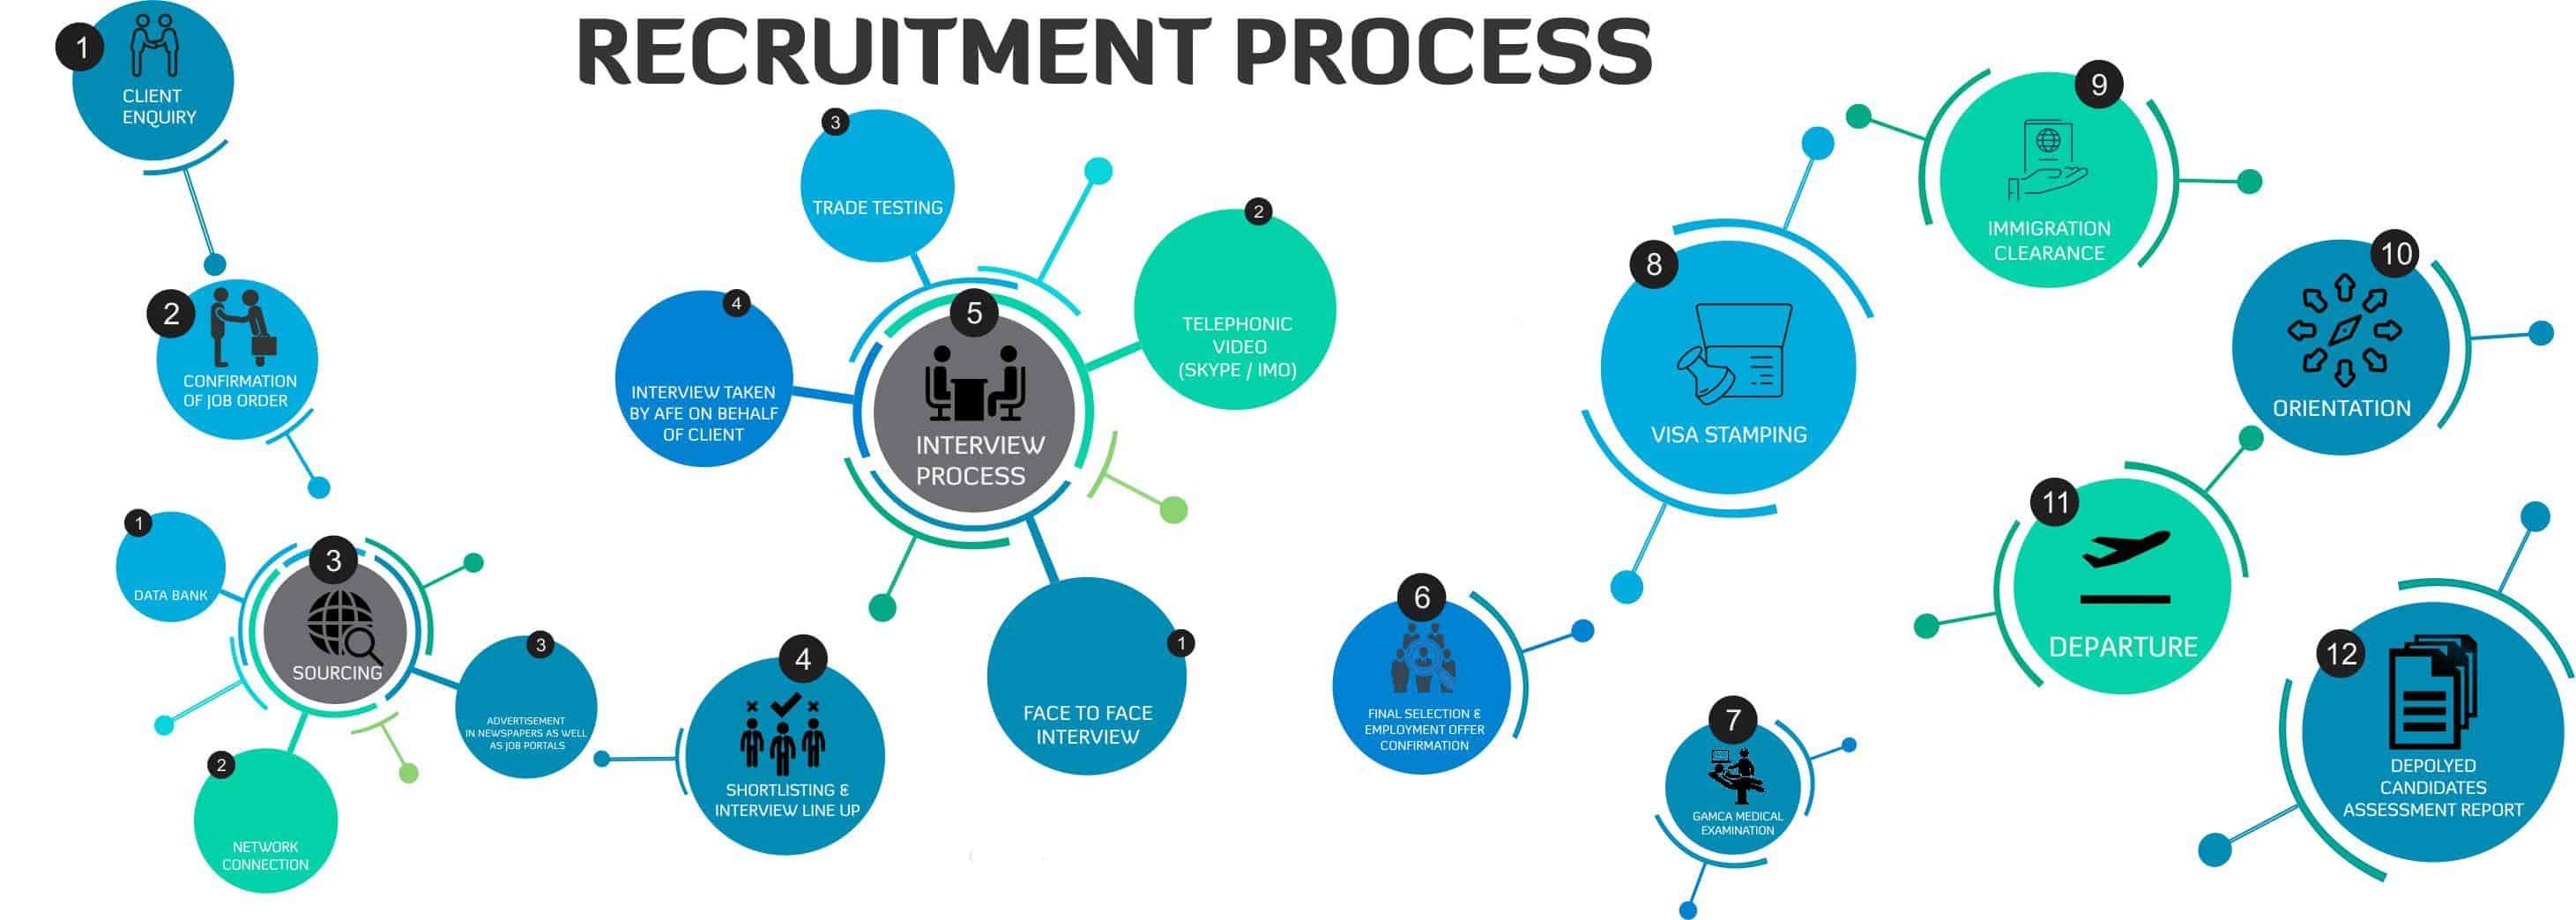 INTERNATIONAL RECRUITMENT SERVICES | Anis Al-Farnas Enterprises